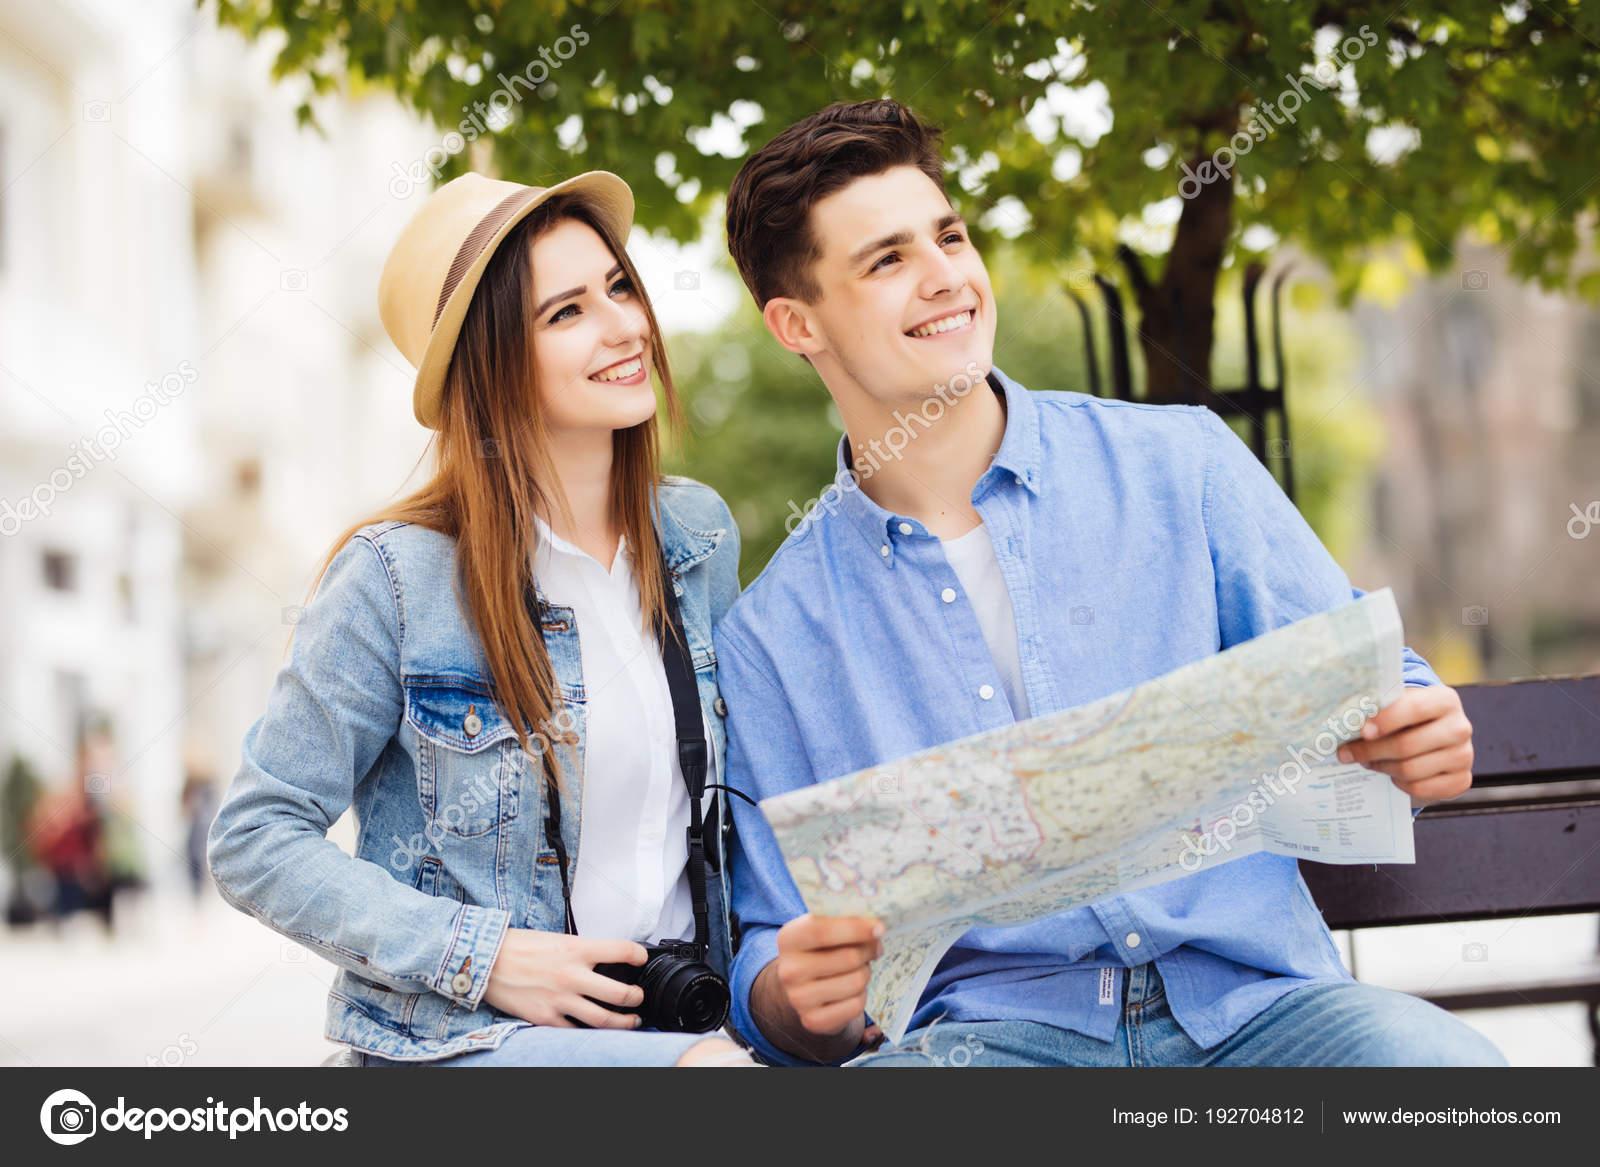 dating service portland maine